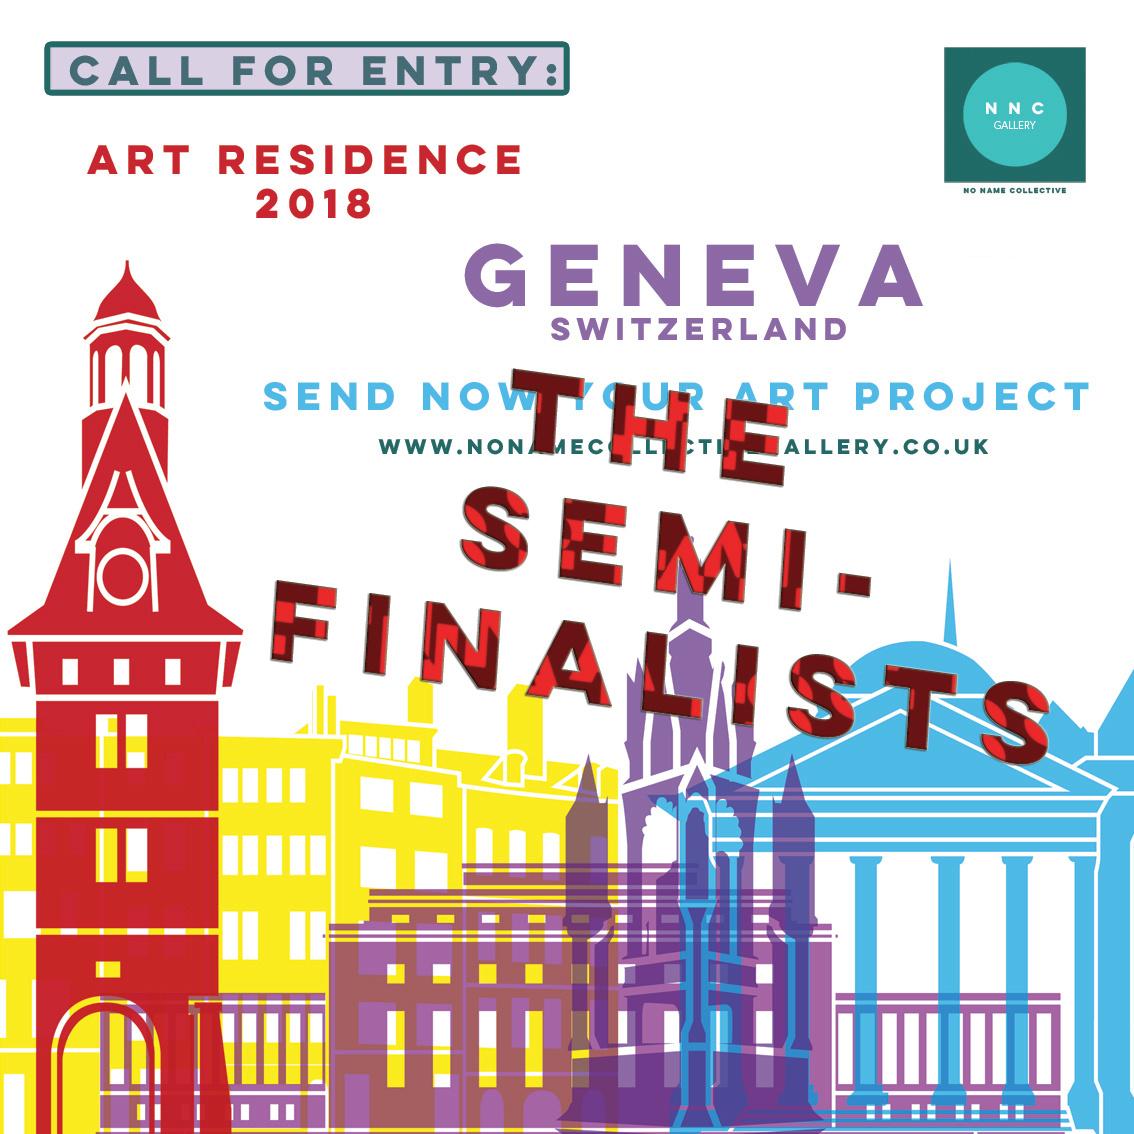 Art Residence Geneva Semi-finalists